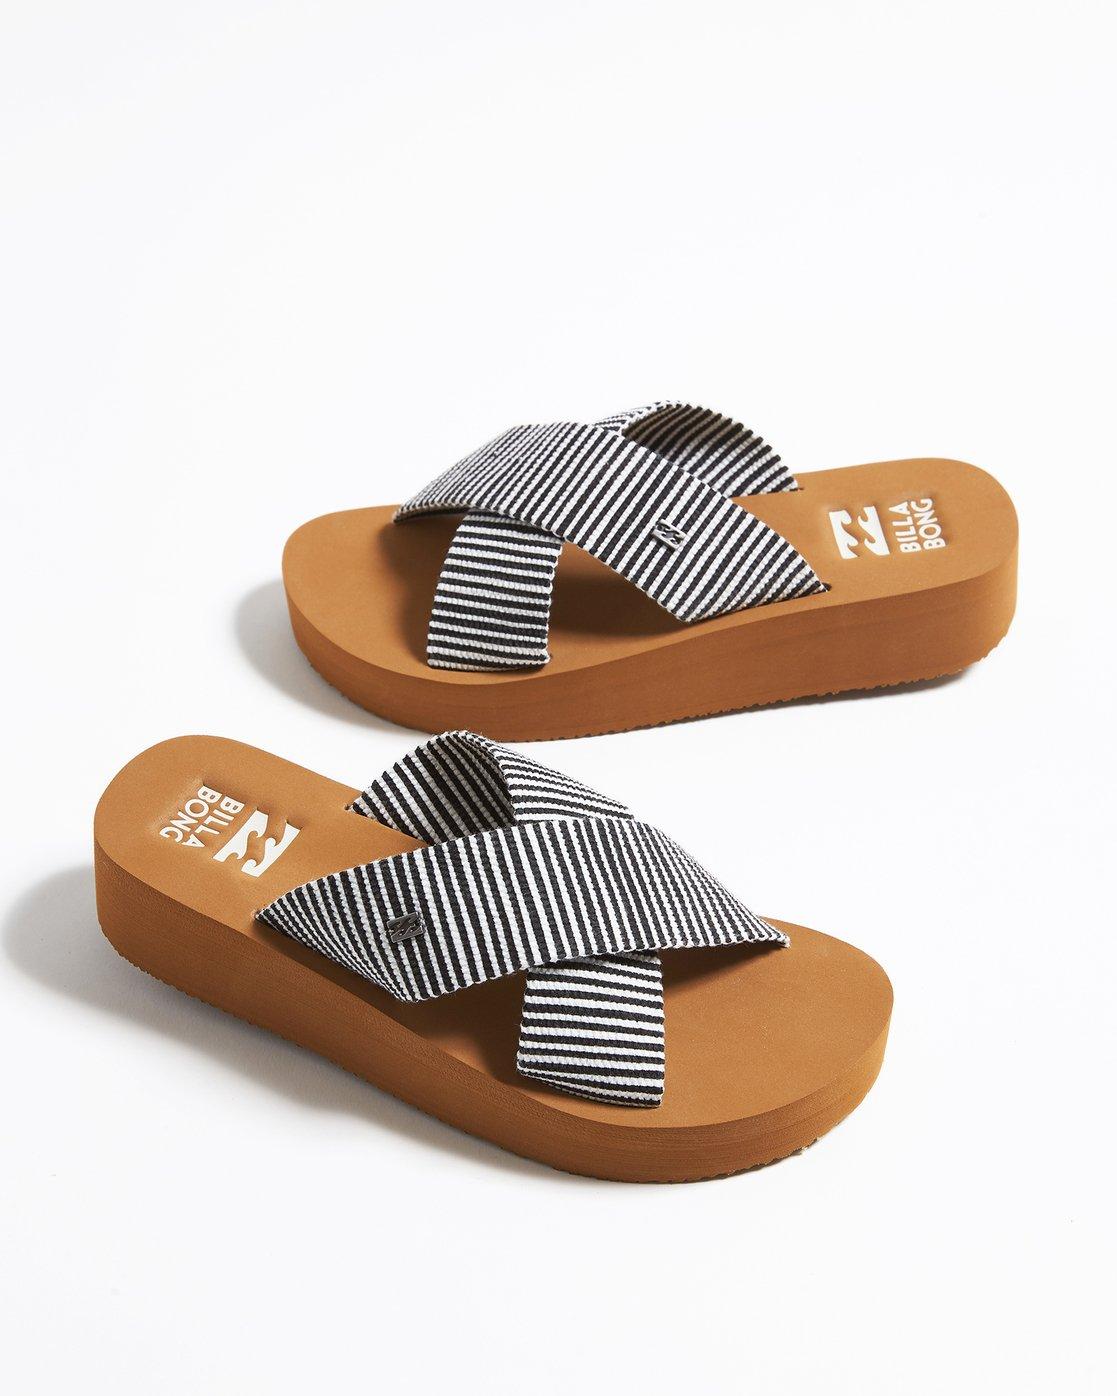 c8ac2793cbaa 0 Boardwalk Sandals Black JFOTTBBW Billabong